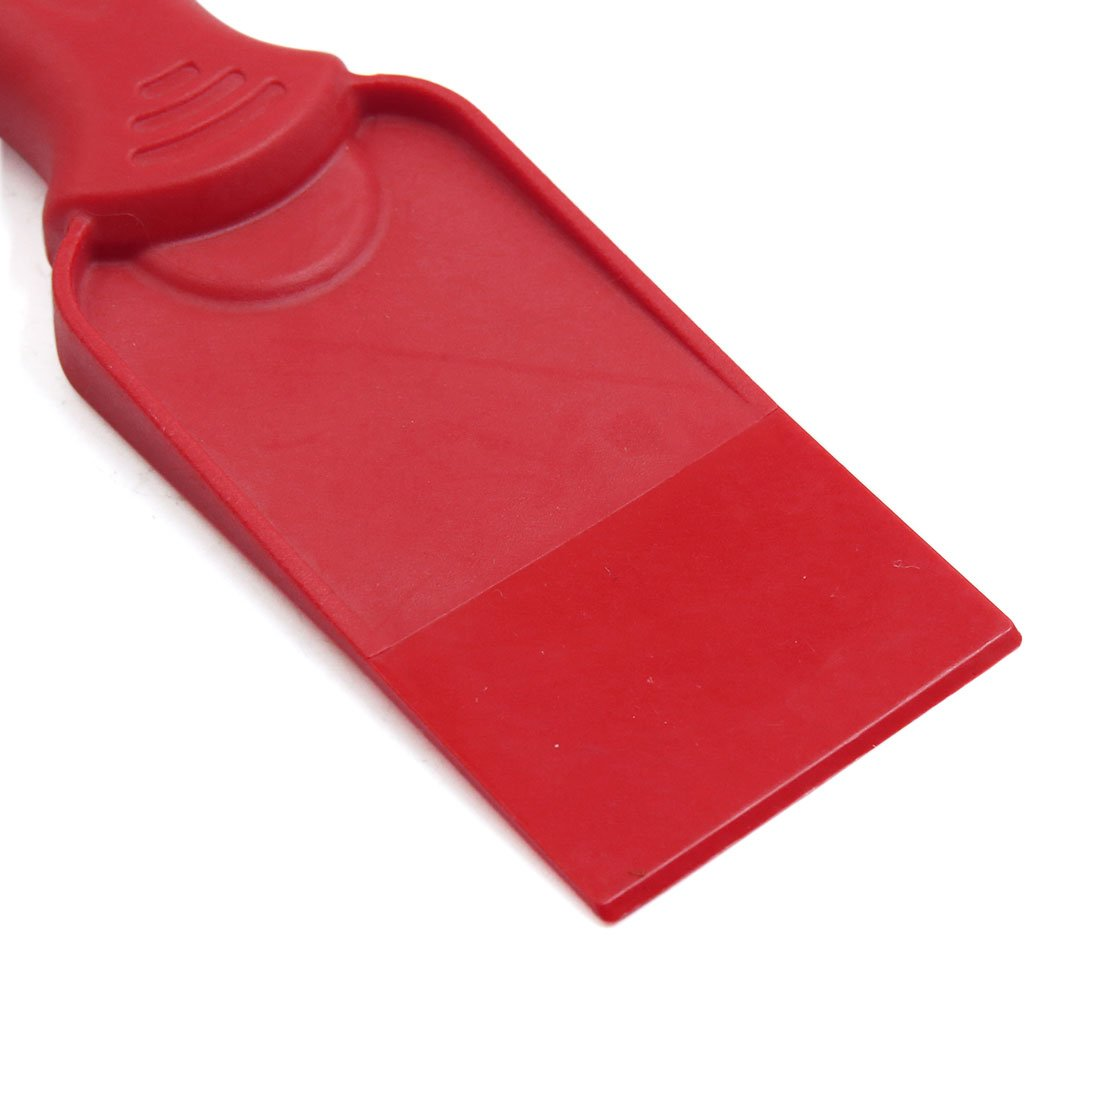 uxcell 2 Width Red Plastic Car Window Sticker Vinyl Film Wraps Remover Scraper a18041800ux0420